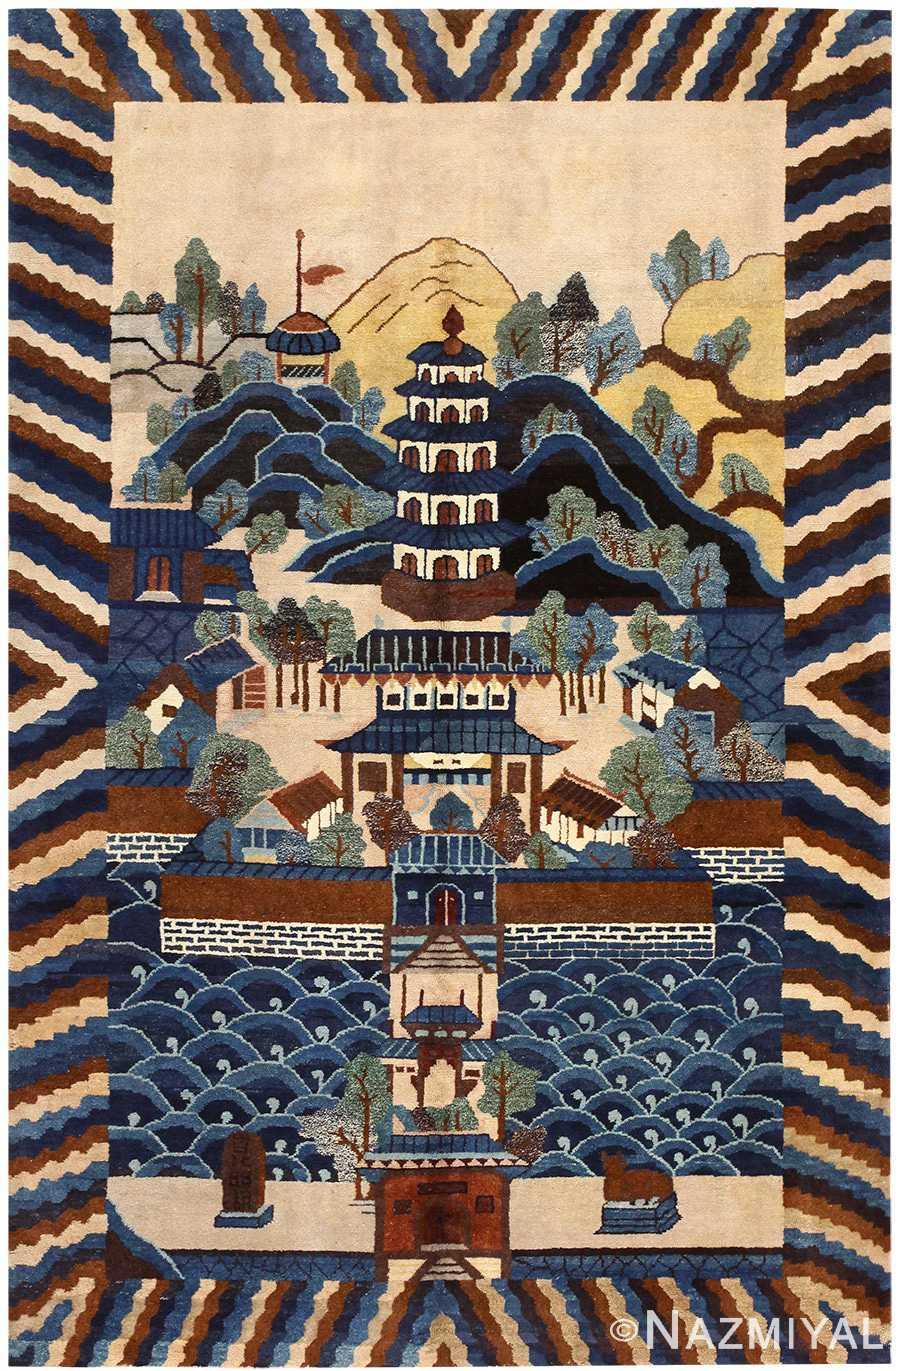 Chinese Deco Rug with Pagoda Scene 48431 Nazmiyal